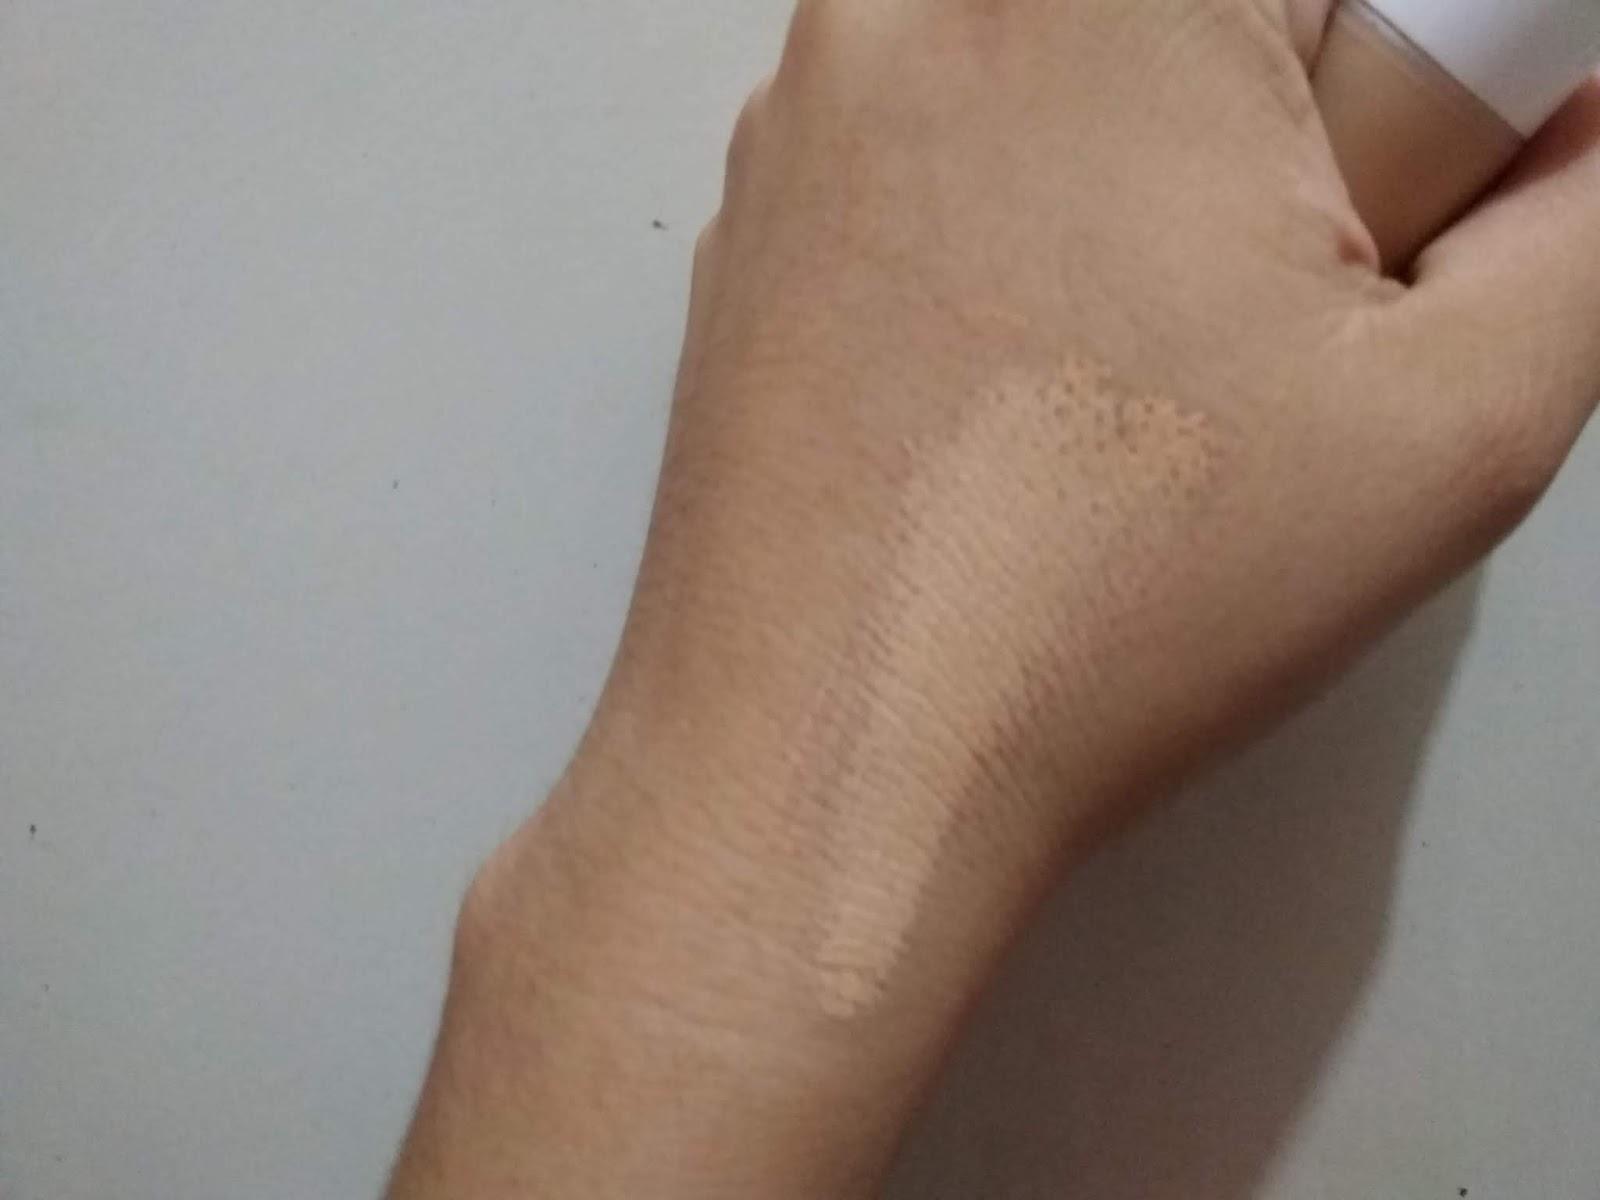 Resenha: Base matte real color trend da Avon